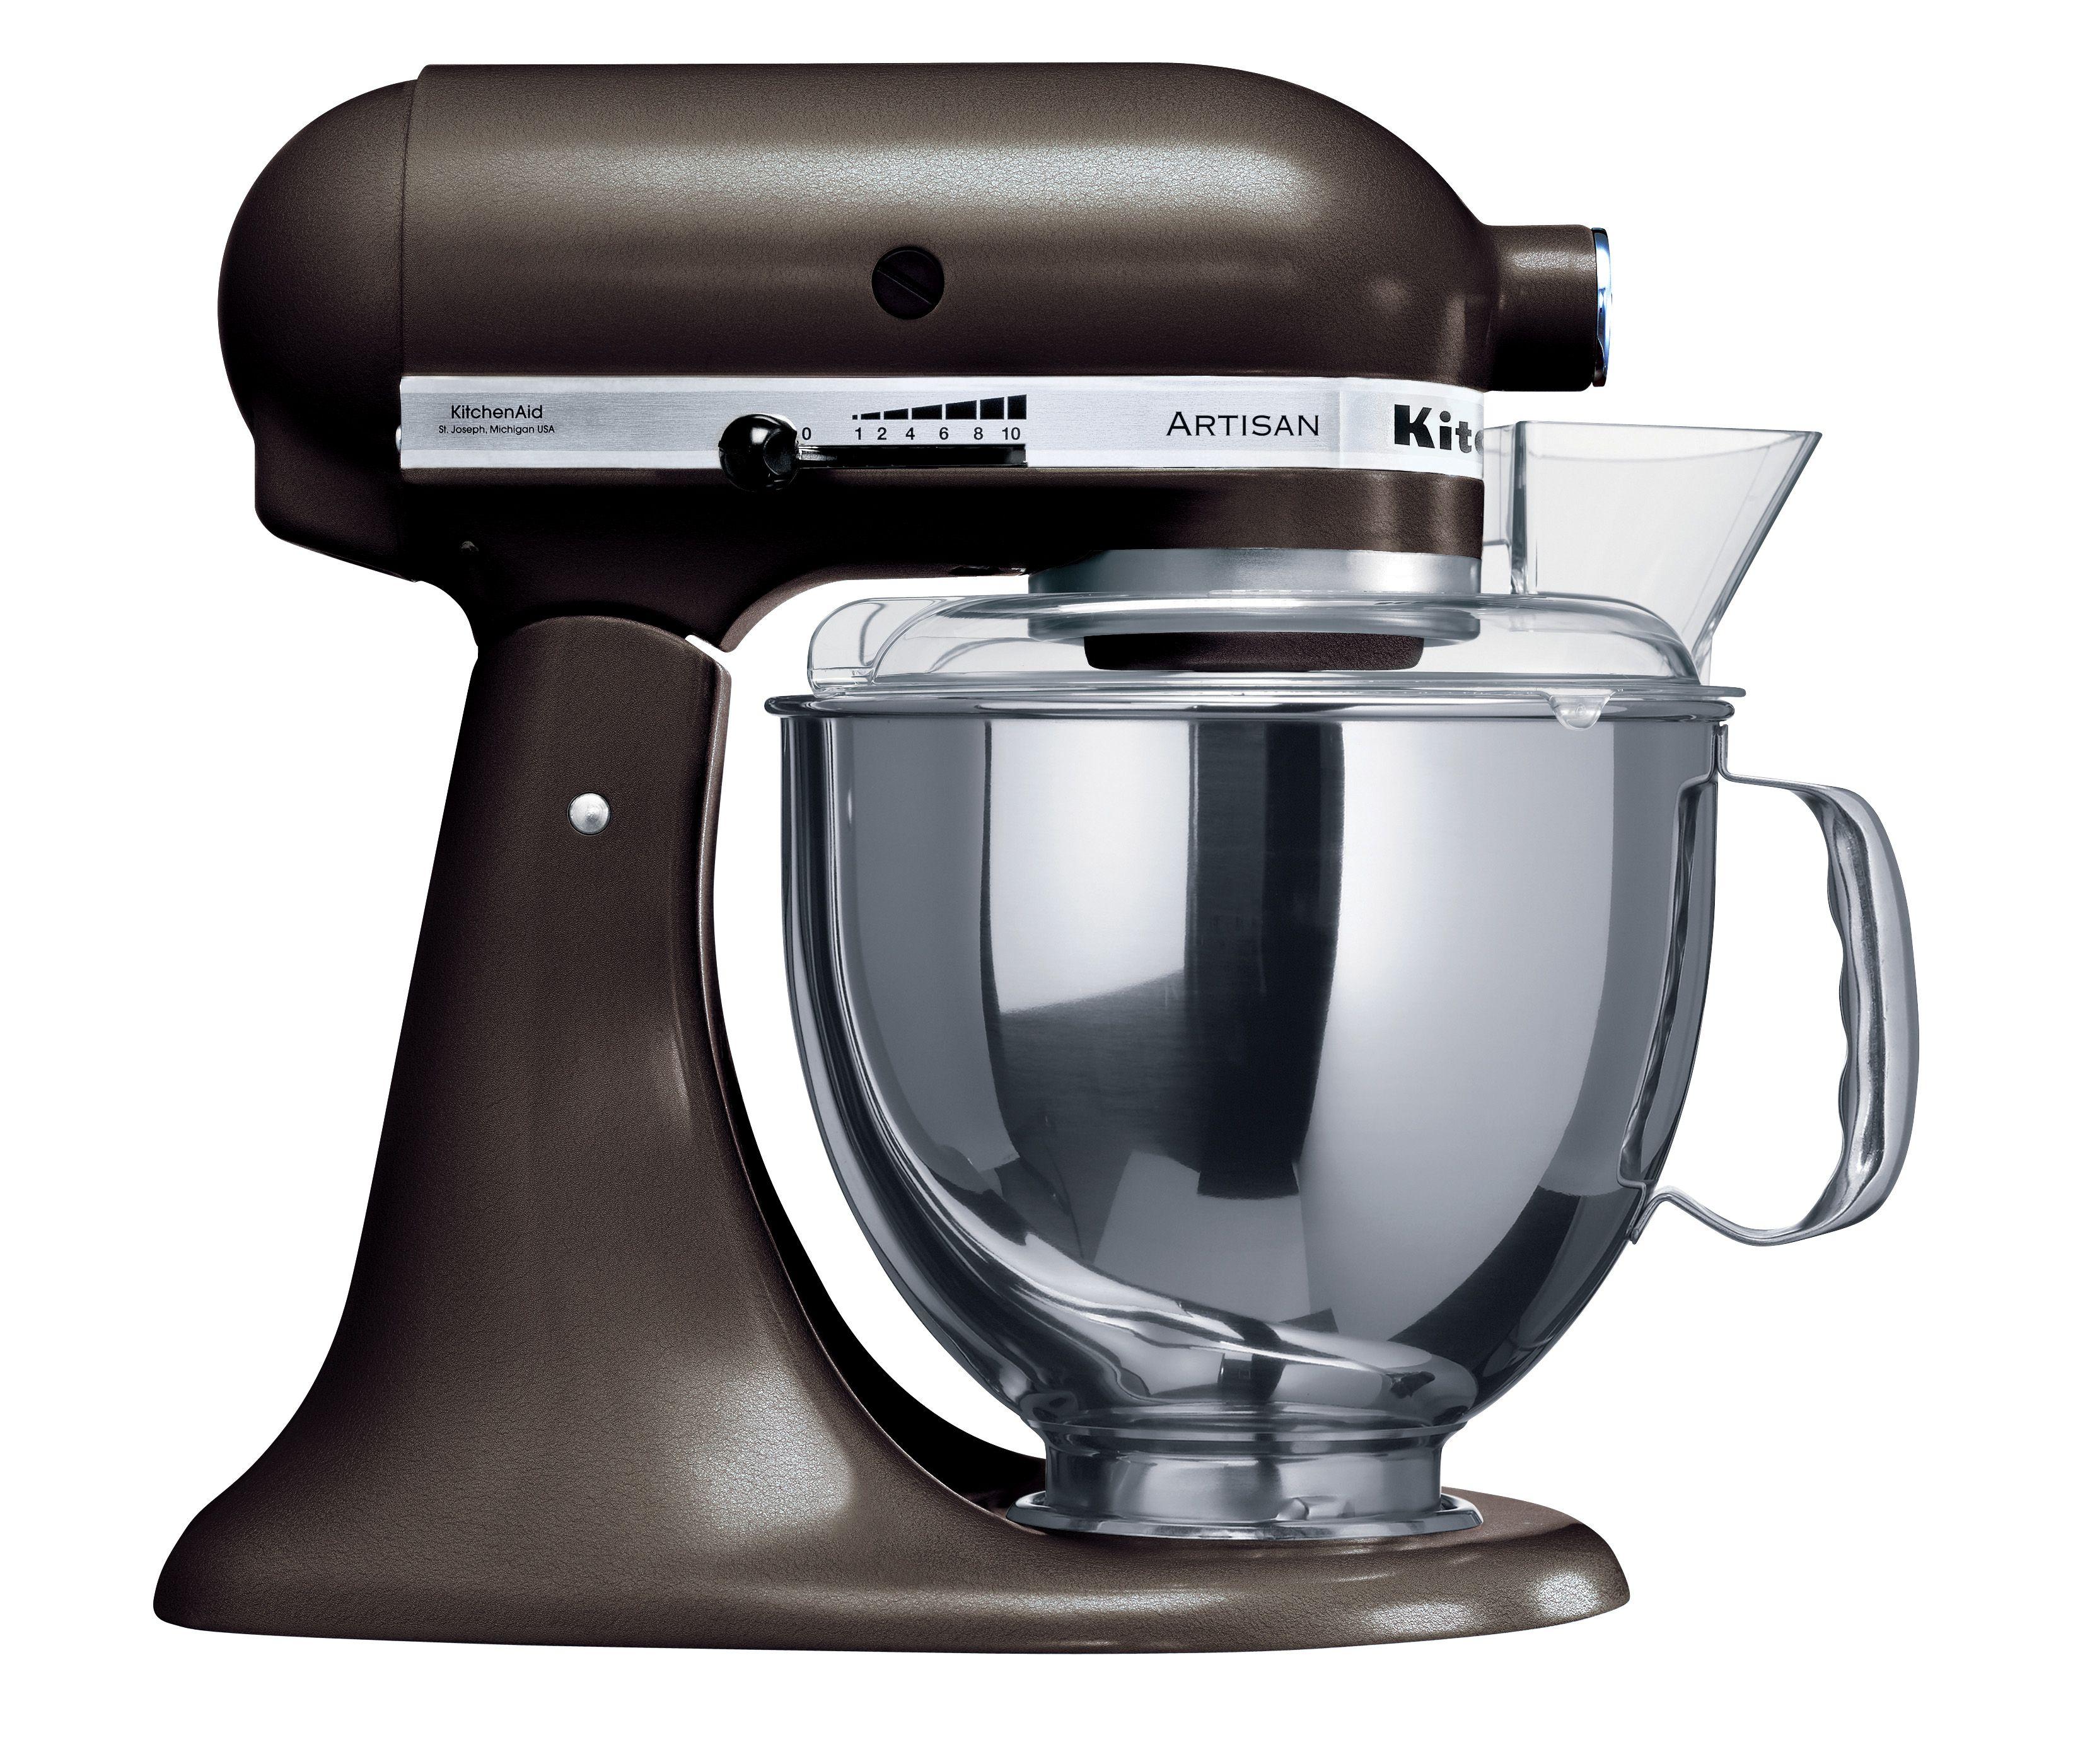 Kitchenaid artisan stand mixer in truffle ksm160